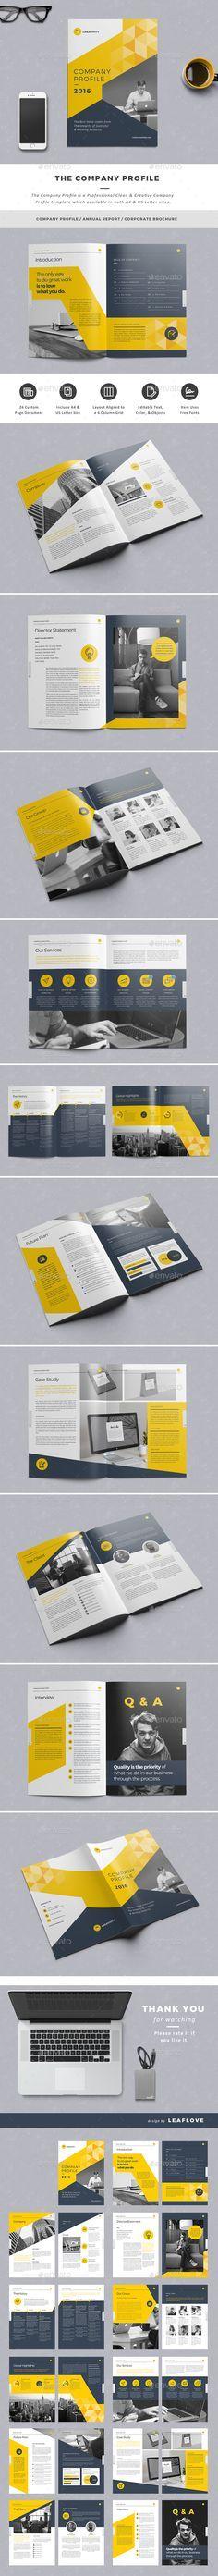 company profile - A5 Company profile, Brochures and Print templates